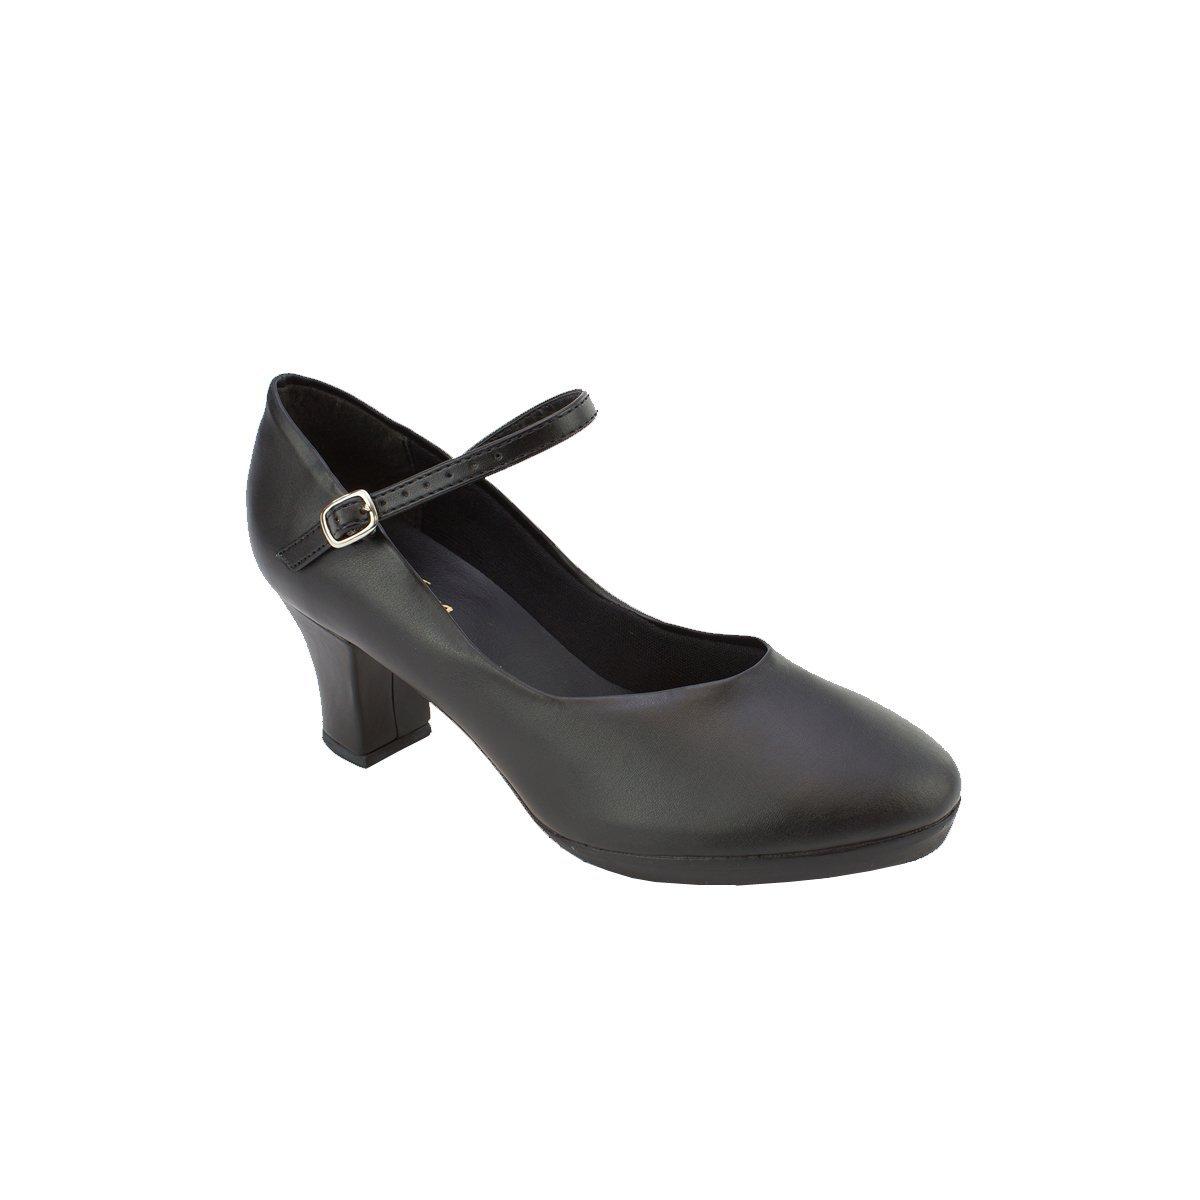 Sodanca Ch-102 Adult Cybil 2 Heel Character Shoe